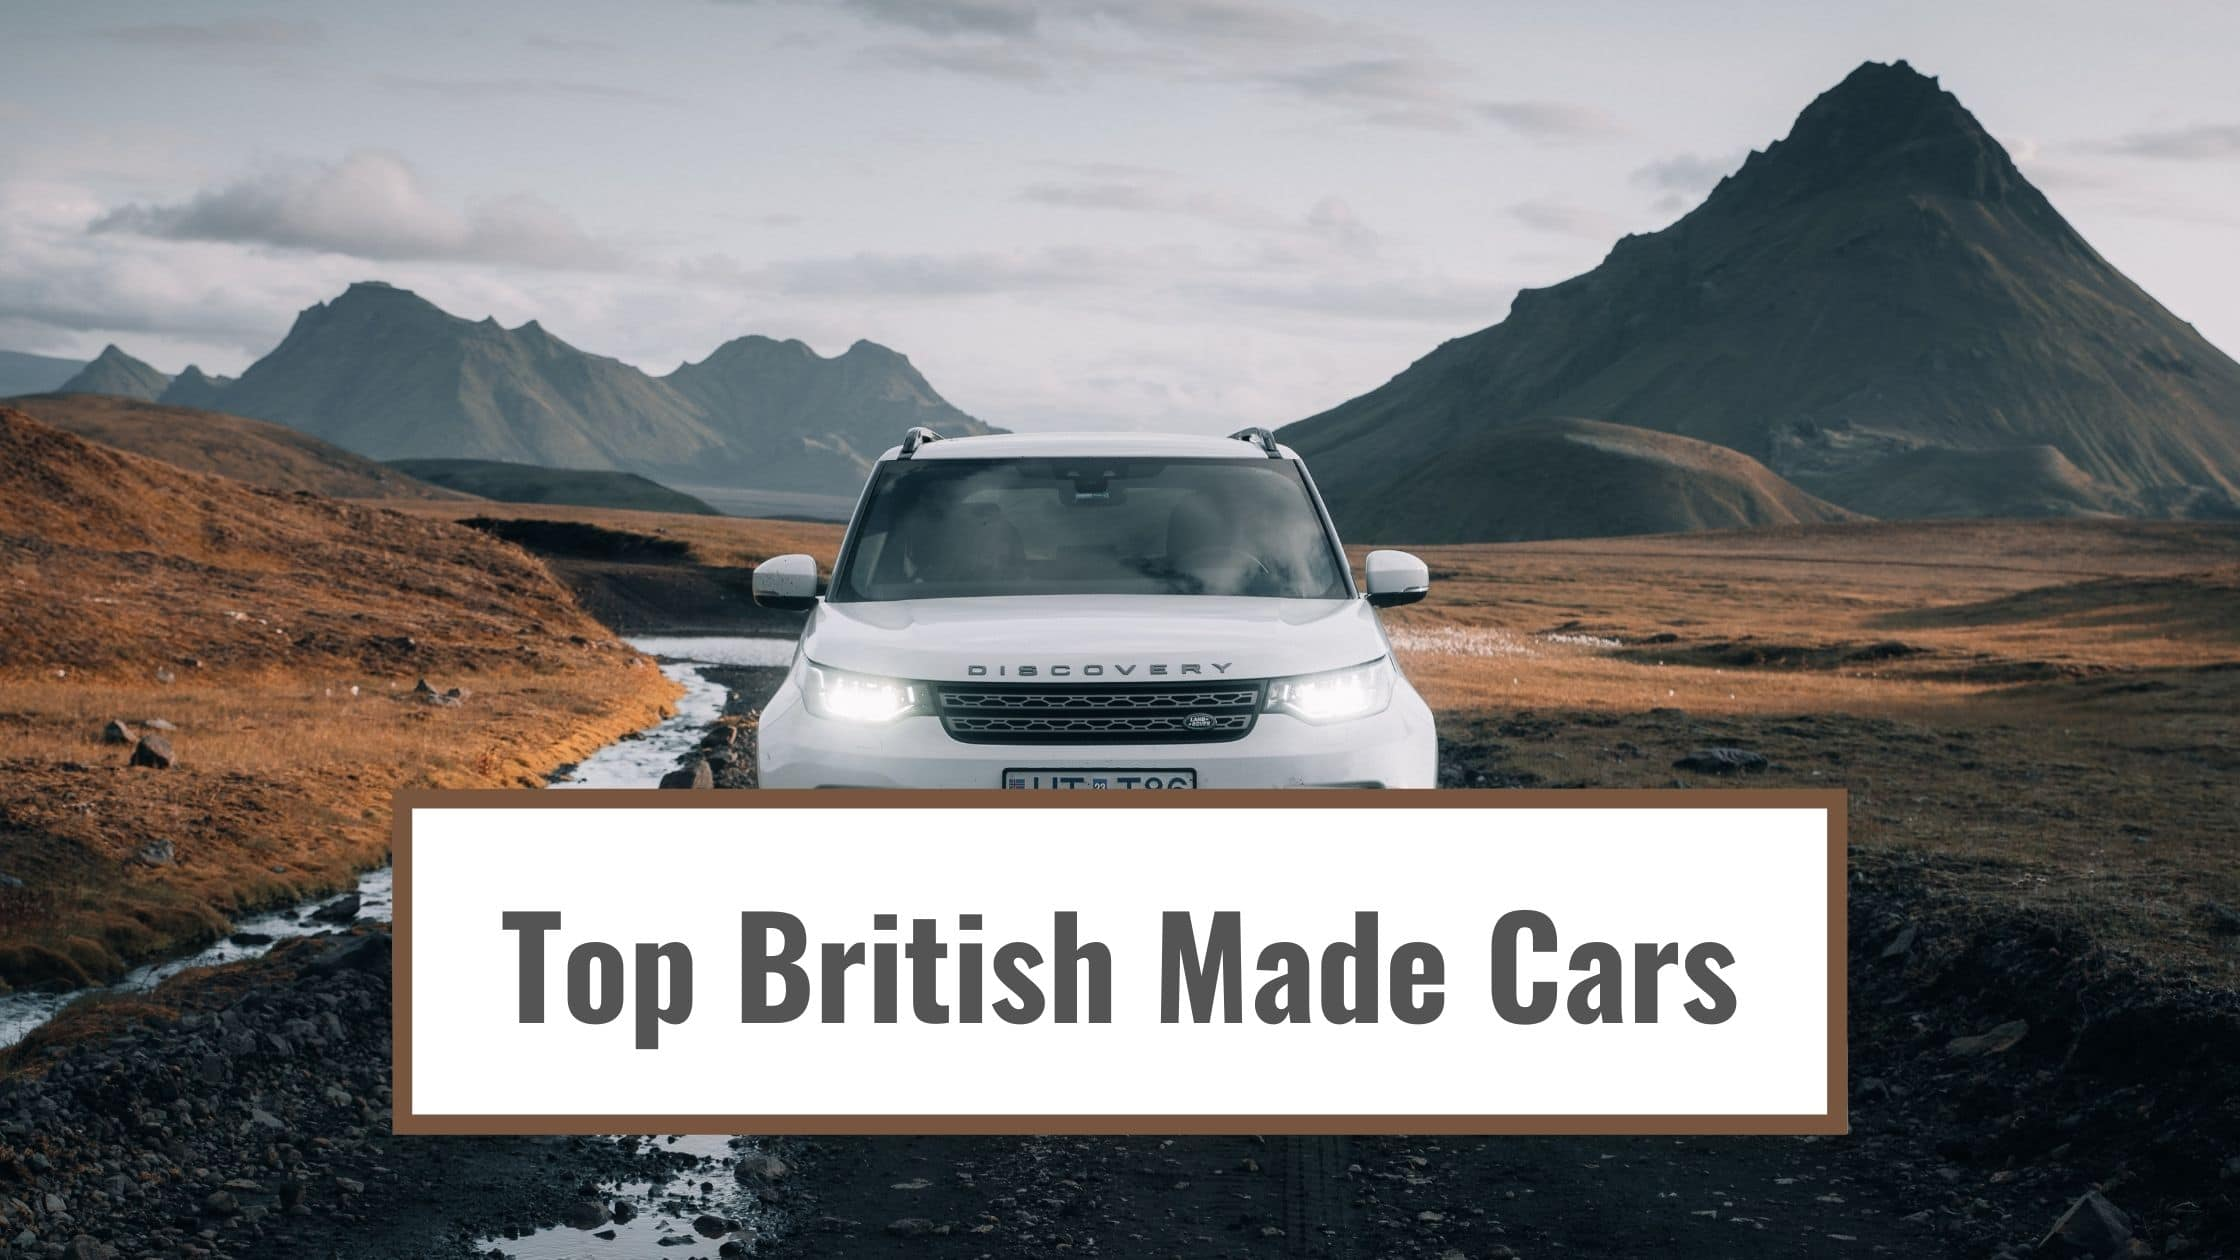 Top British Made Cars